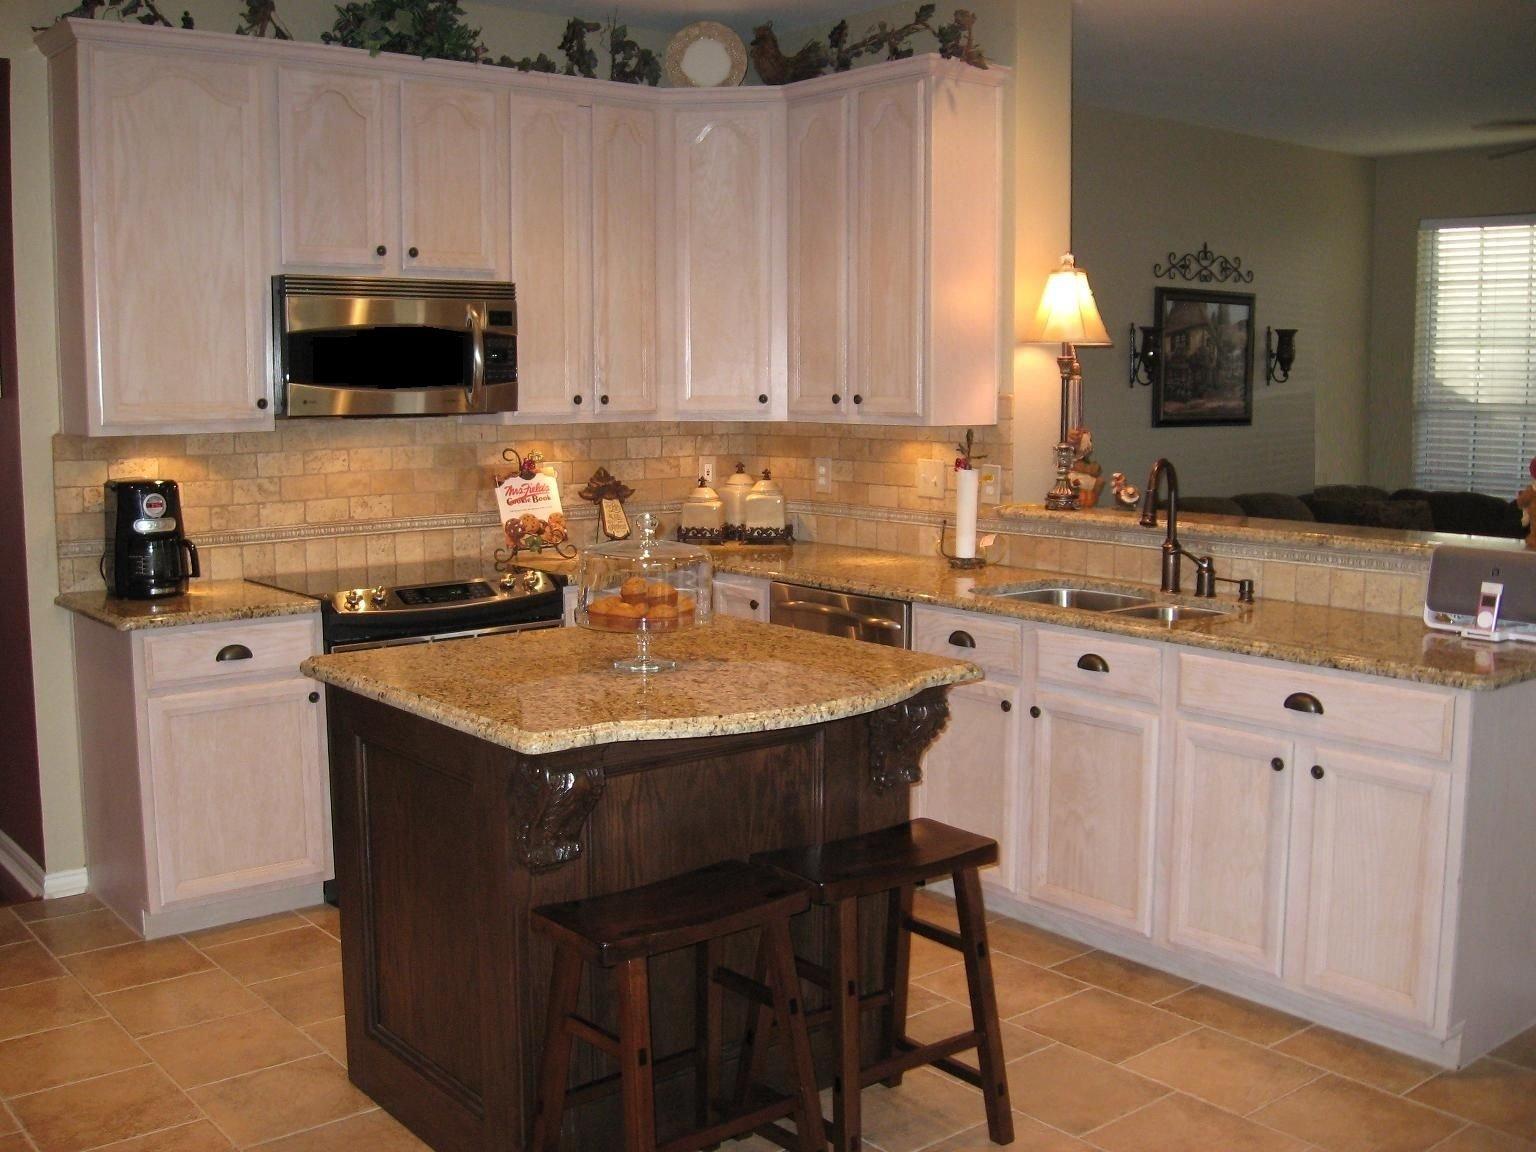 10 Amazing New Venetian Gold Granite Backsplash Ideas new venetian gold granite with backsplash granite countertops 2021